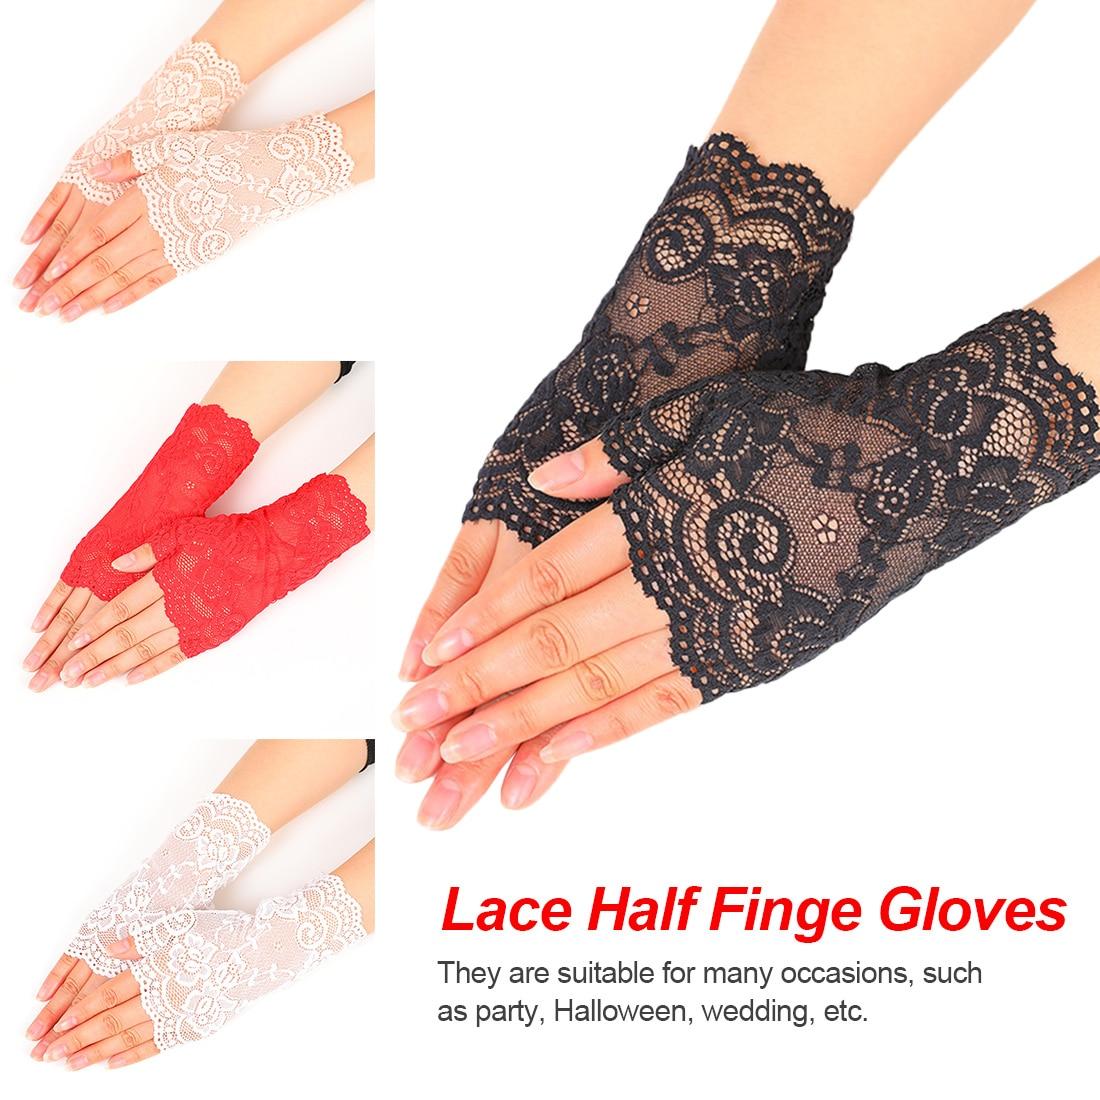 Summer Chic Knit Wedding Fingerless Lace Gloves Women Driving Fishnet Gloves NEW